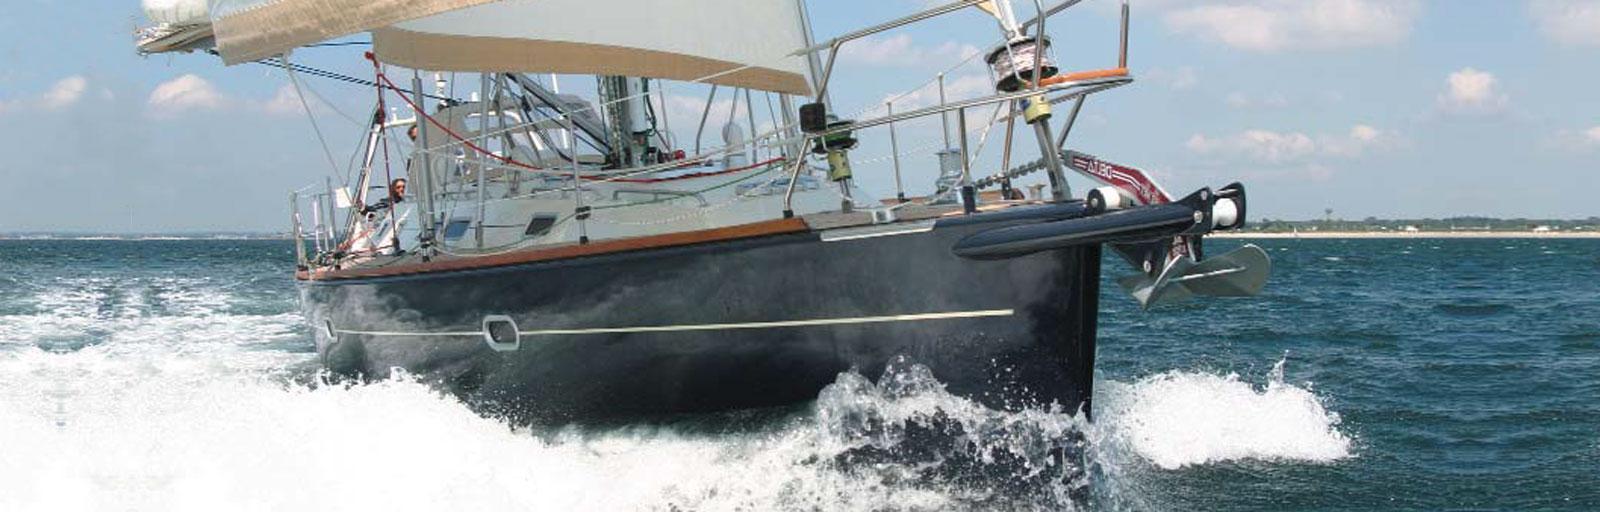 AYC Yachtbroker - Alliage 44